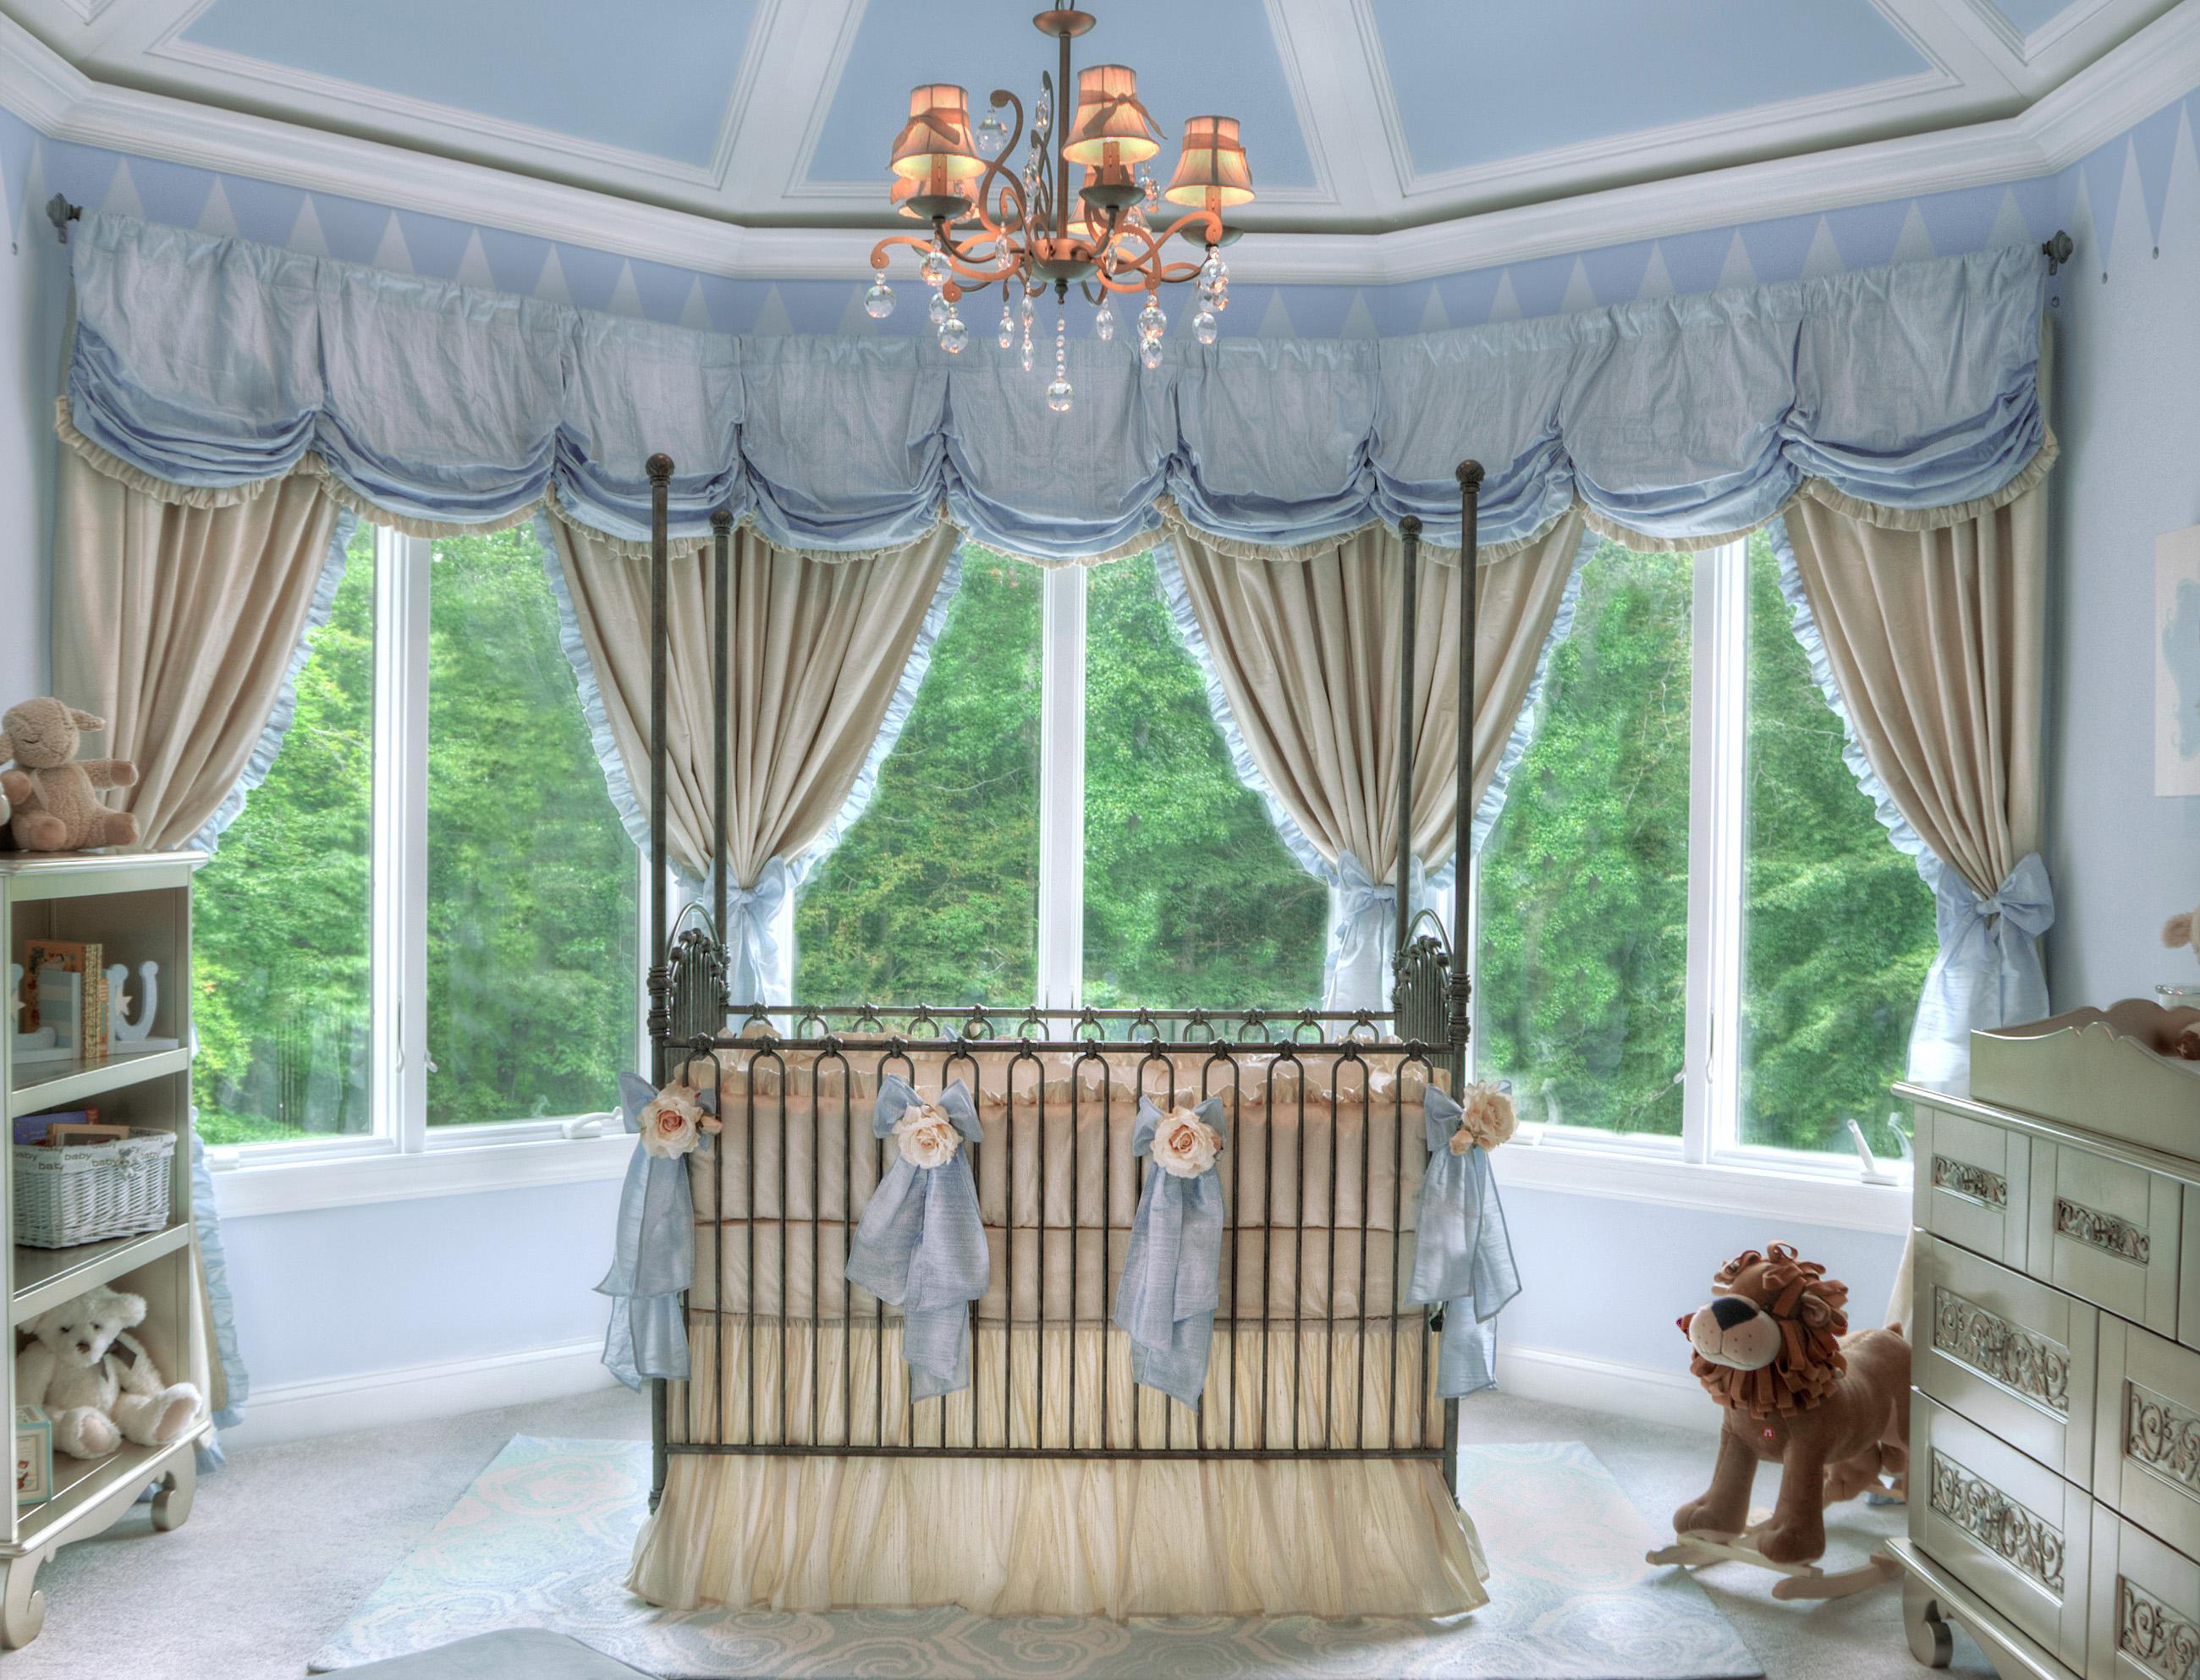 Royal Prince Nursery, Fairytale Theme Baby Room by Sherri Blum, Celebrity Interior Designer